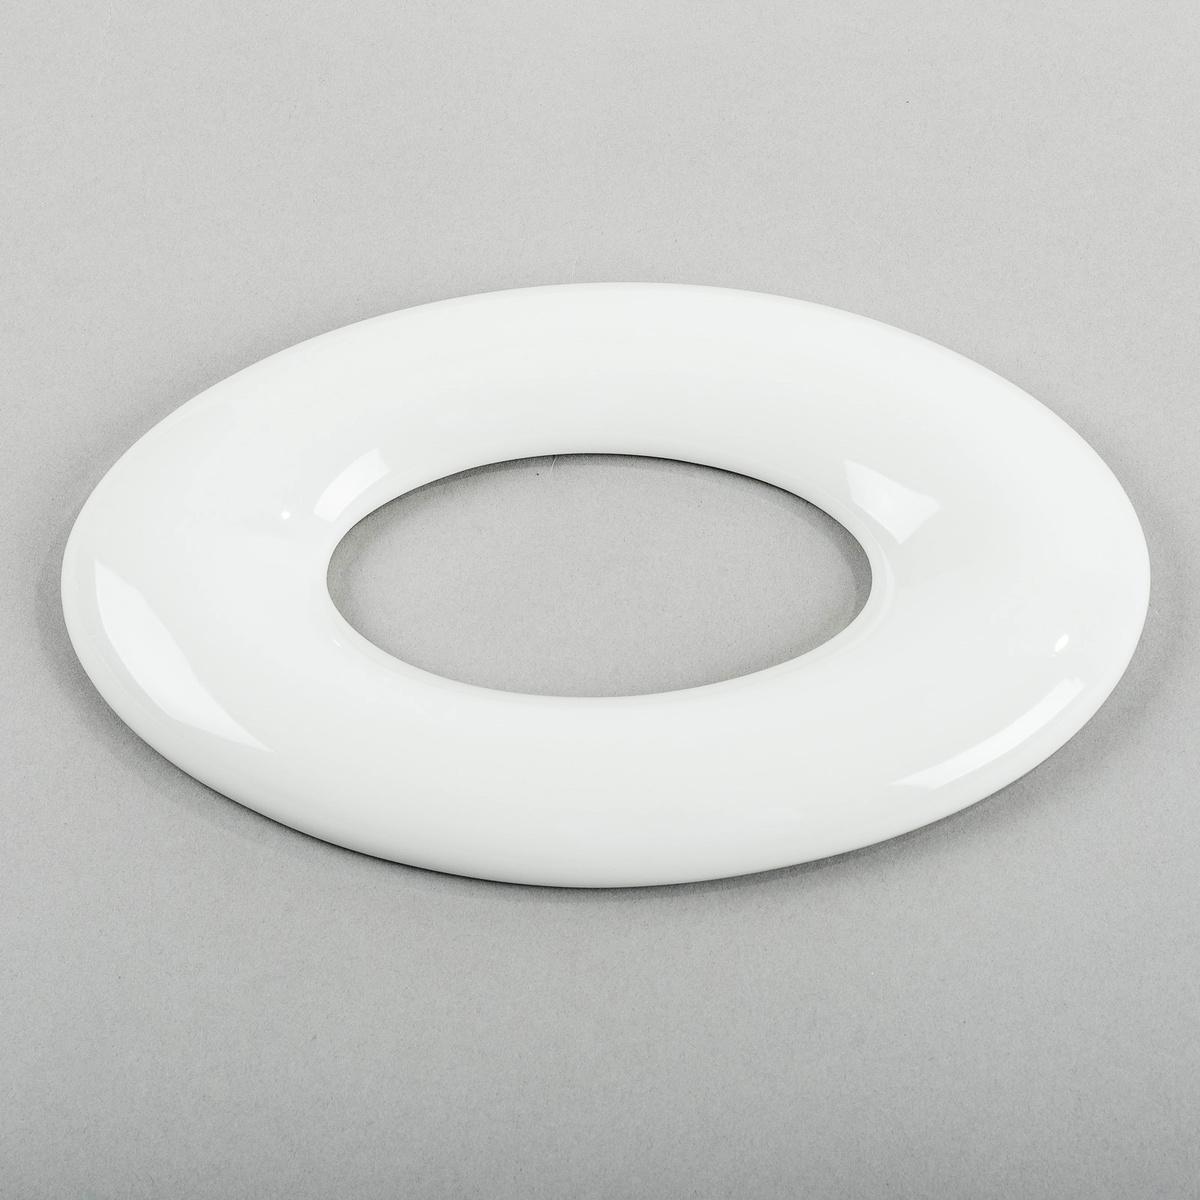 Studio Pirsc Porcelain 3D tapeta OVAL 24 cm, bílá